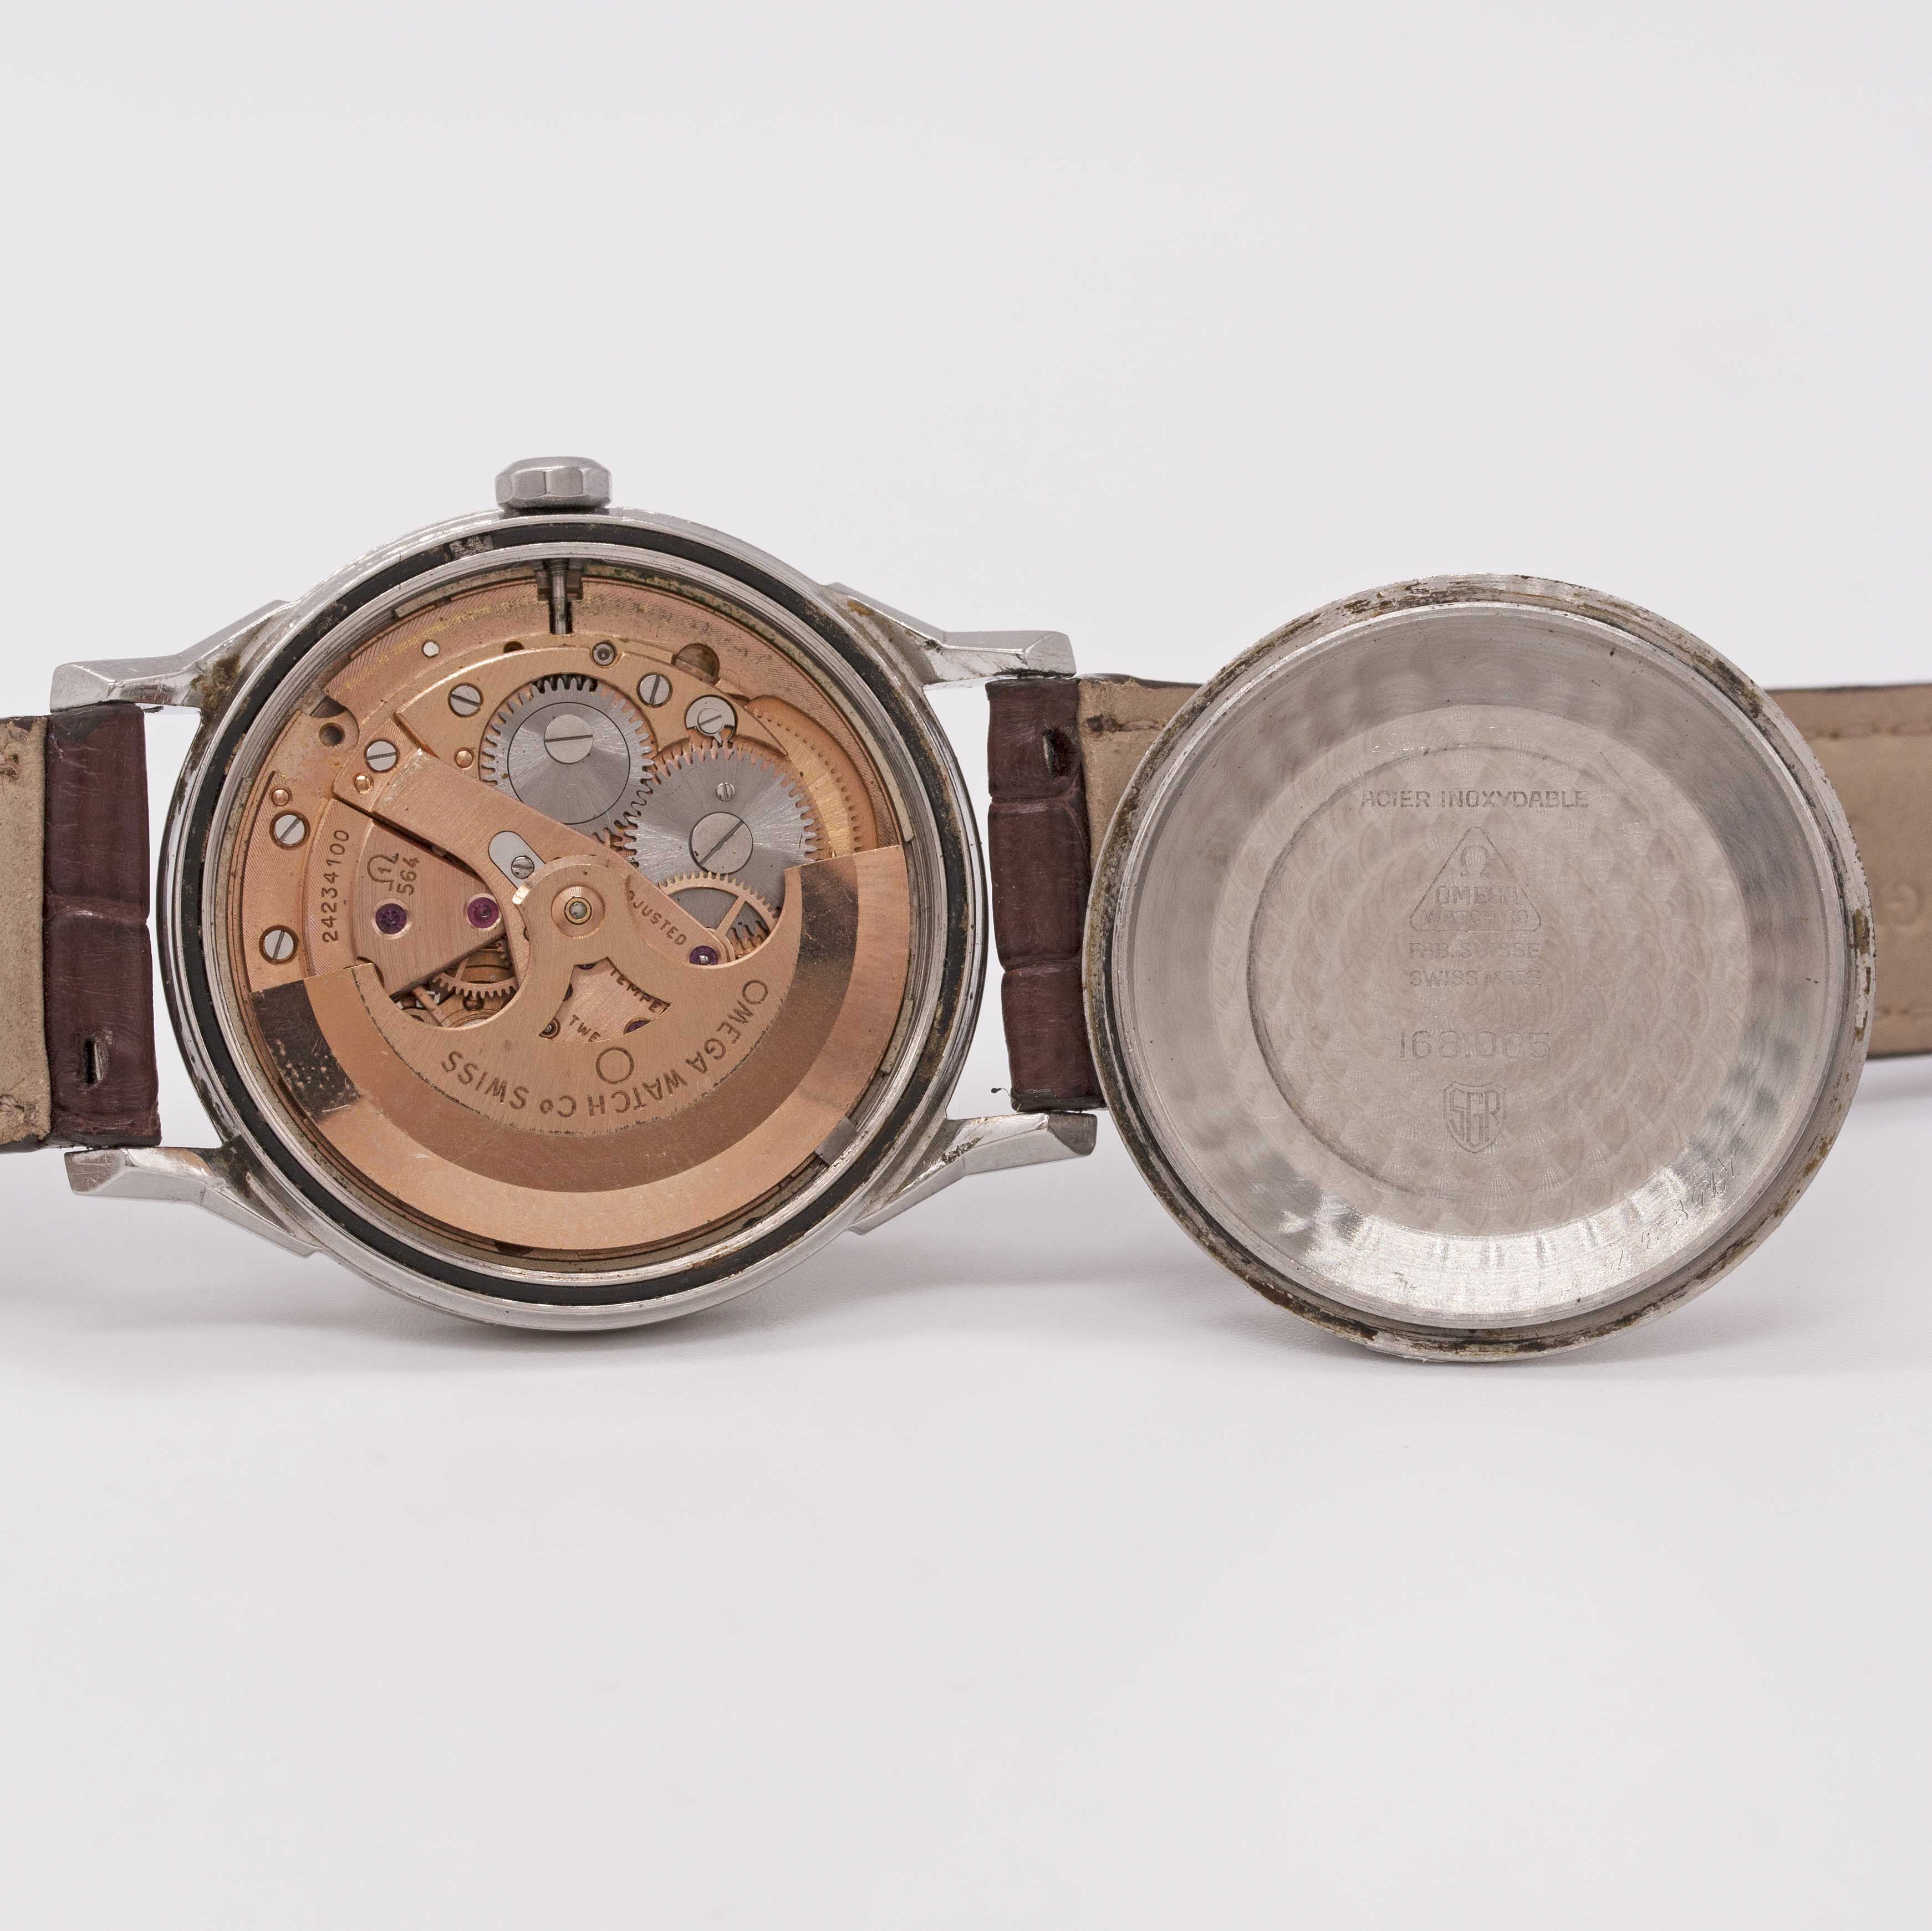 Lot 20 - A GENTLEMAN'S STAINLESS STEEL OMEGA CONSTELLATION CHRONOMETER WRIST WATCH CIRCA 1967, REF. 168.005